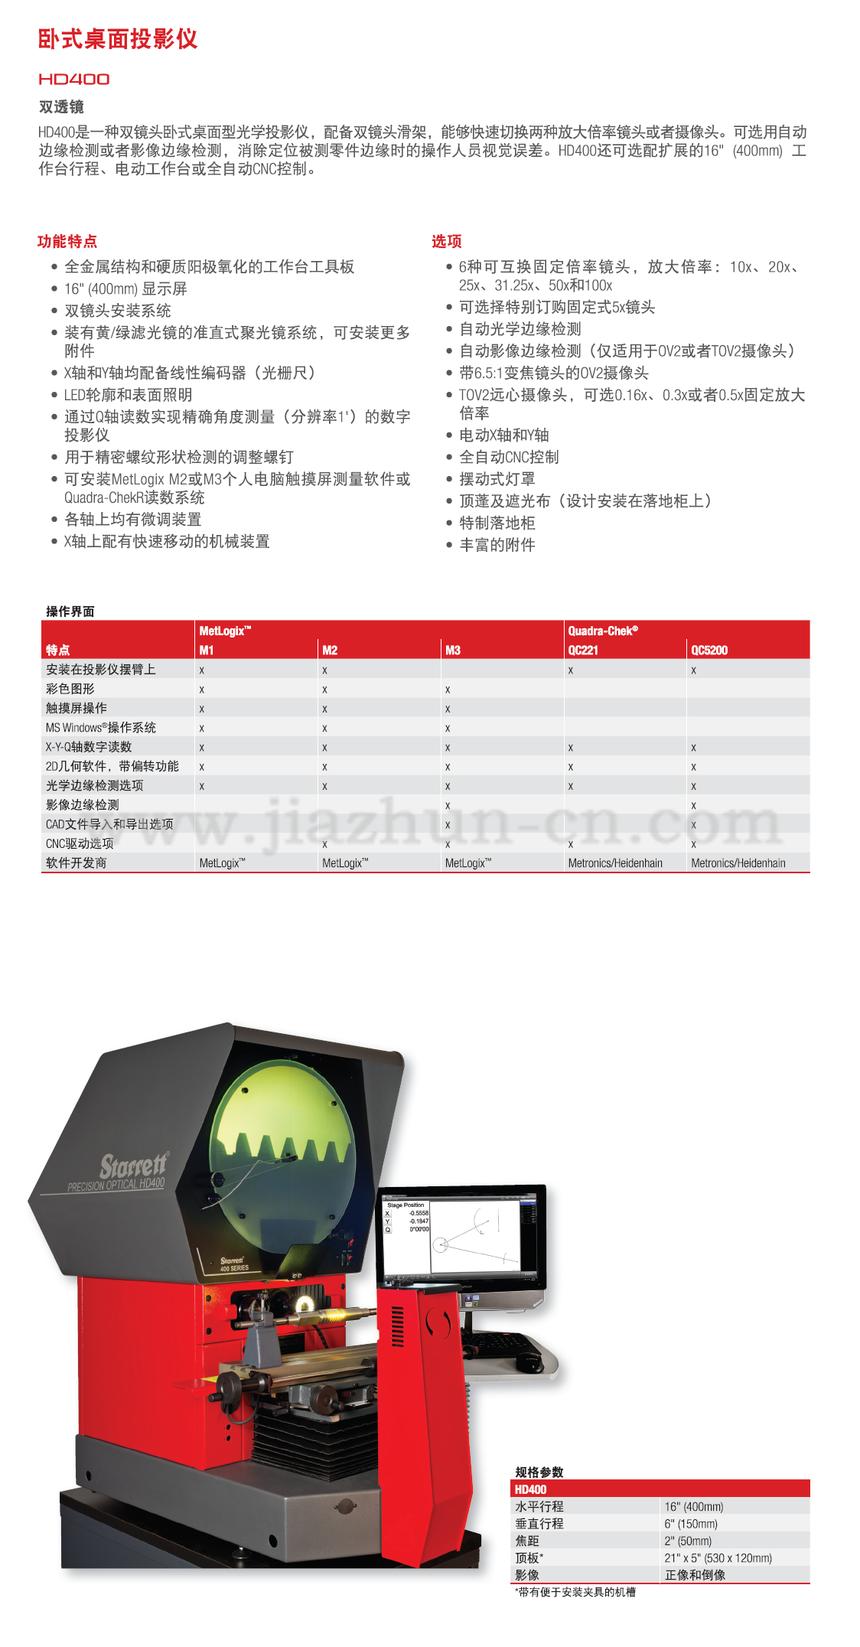 卧式投影仪HD400.png